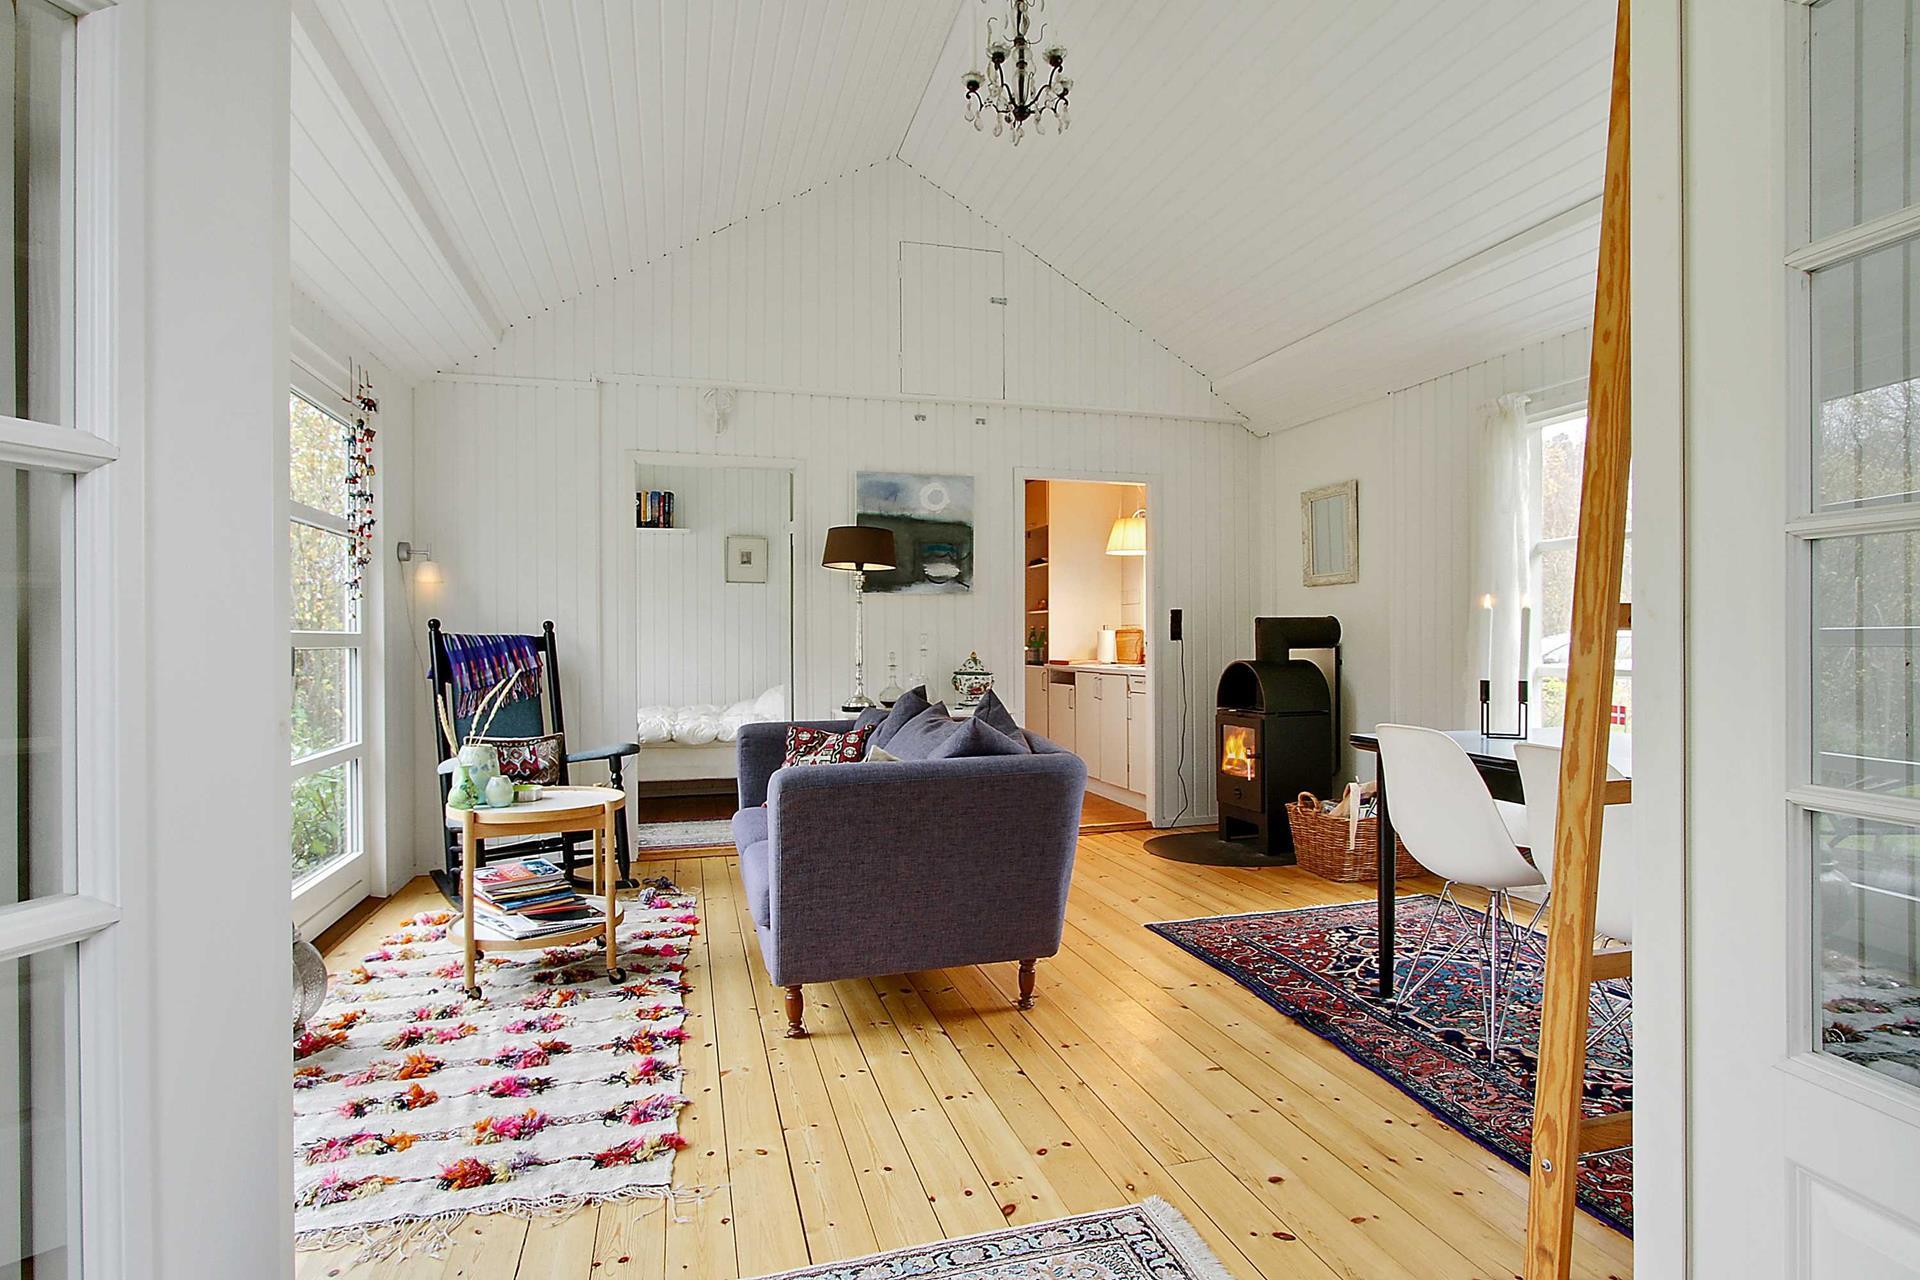 Gallery black and white danish summerhouse